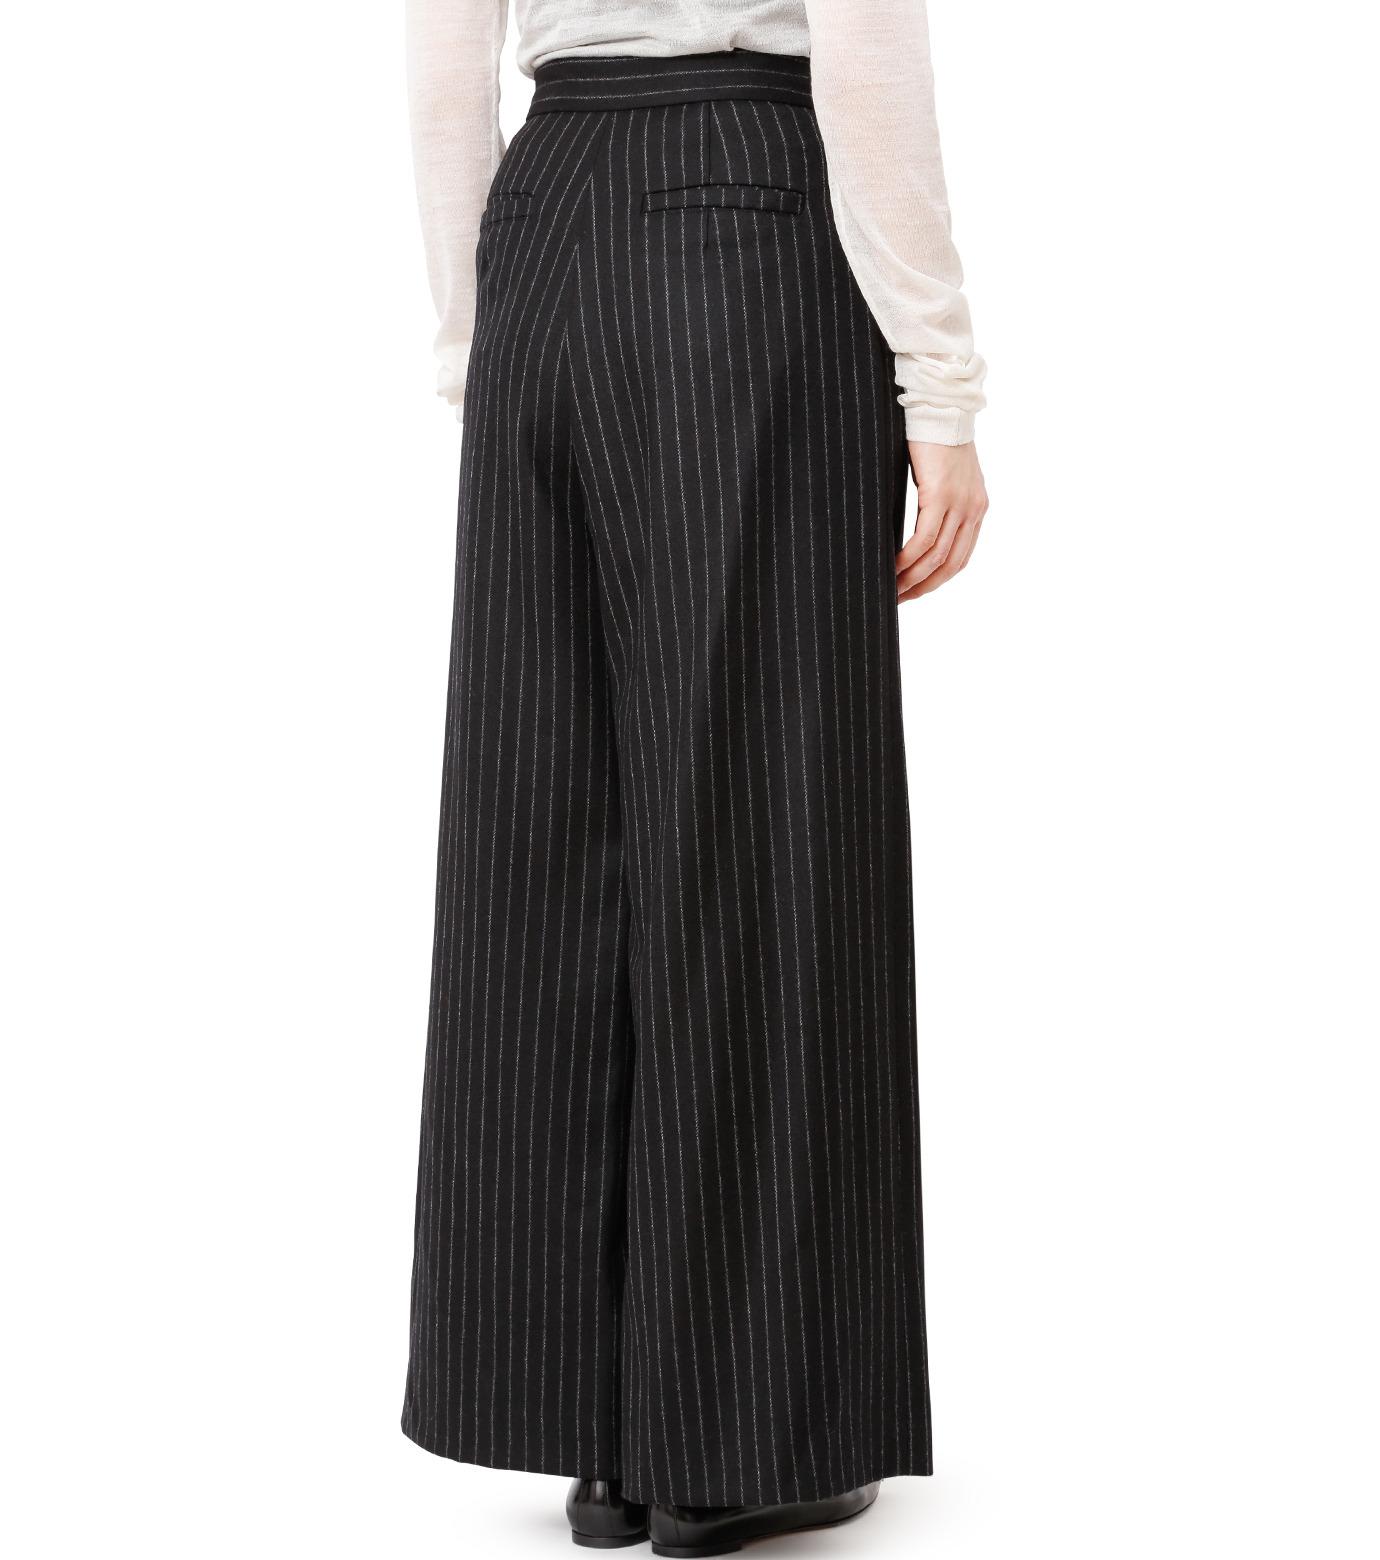 CHRISTIAN DADA(クリスチャン ダダ)のStriped Wideleg Trouser w/Buckle-BLACK(パンツ/pants)-16W-D-0607-13 拡大詳細画像2